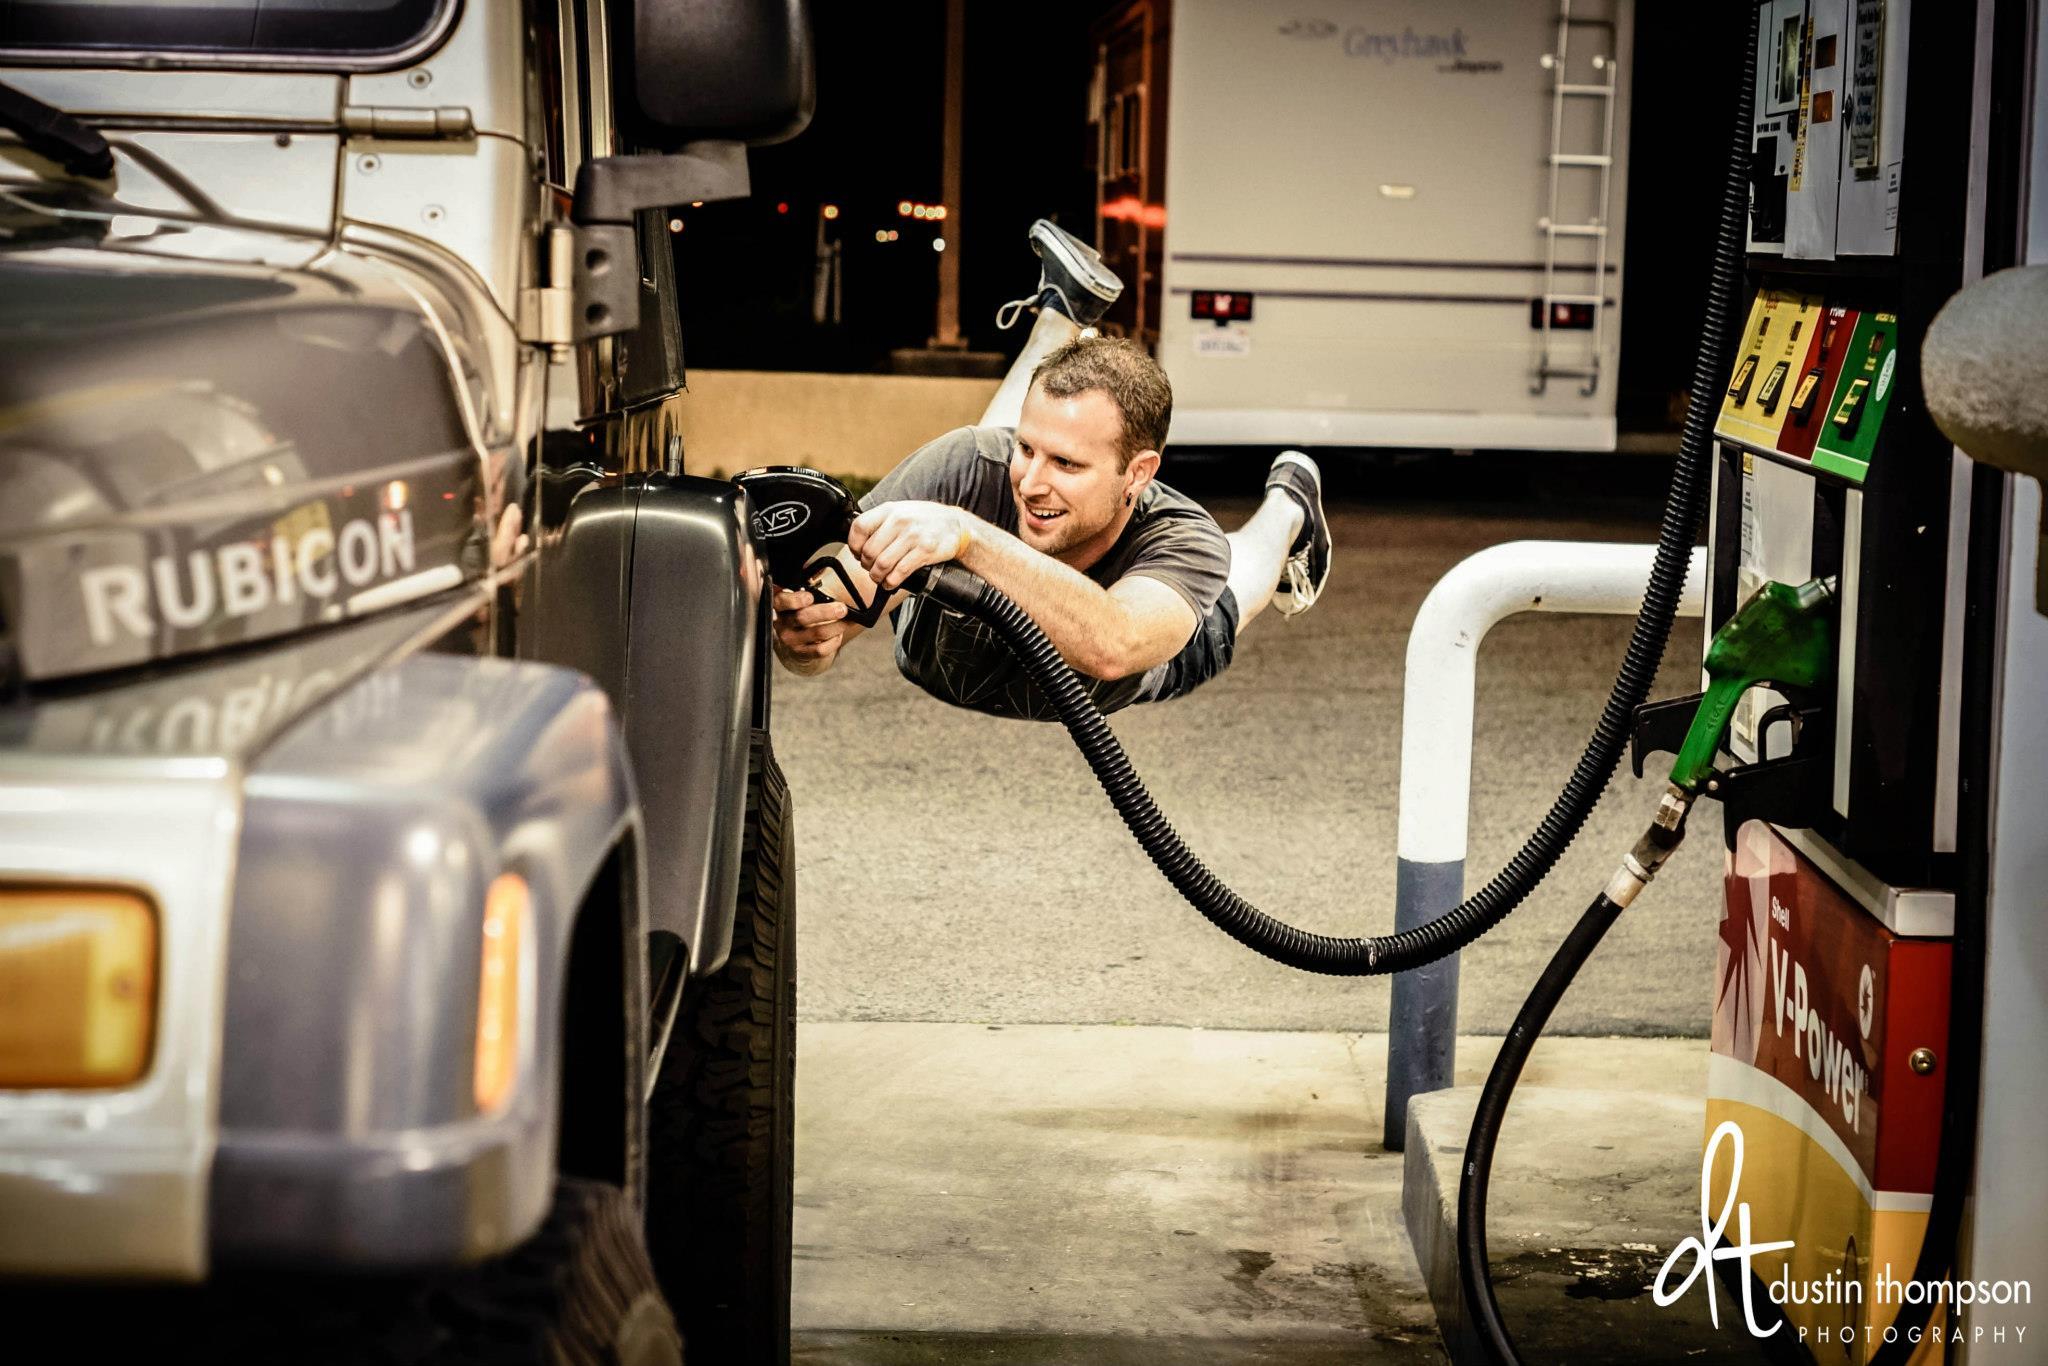 dustin thompson gas station